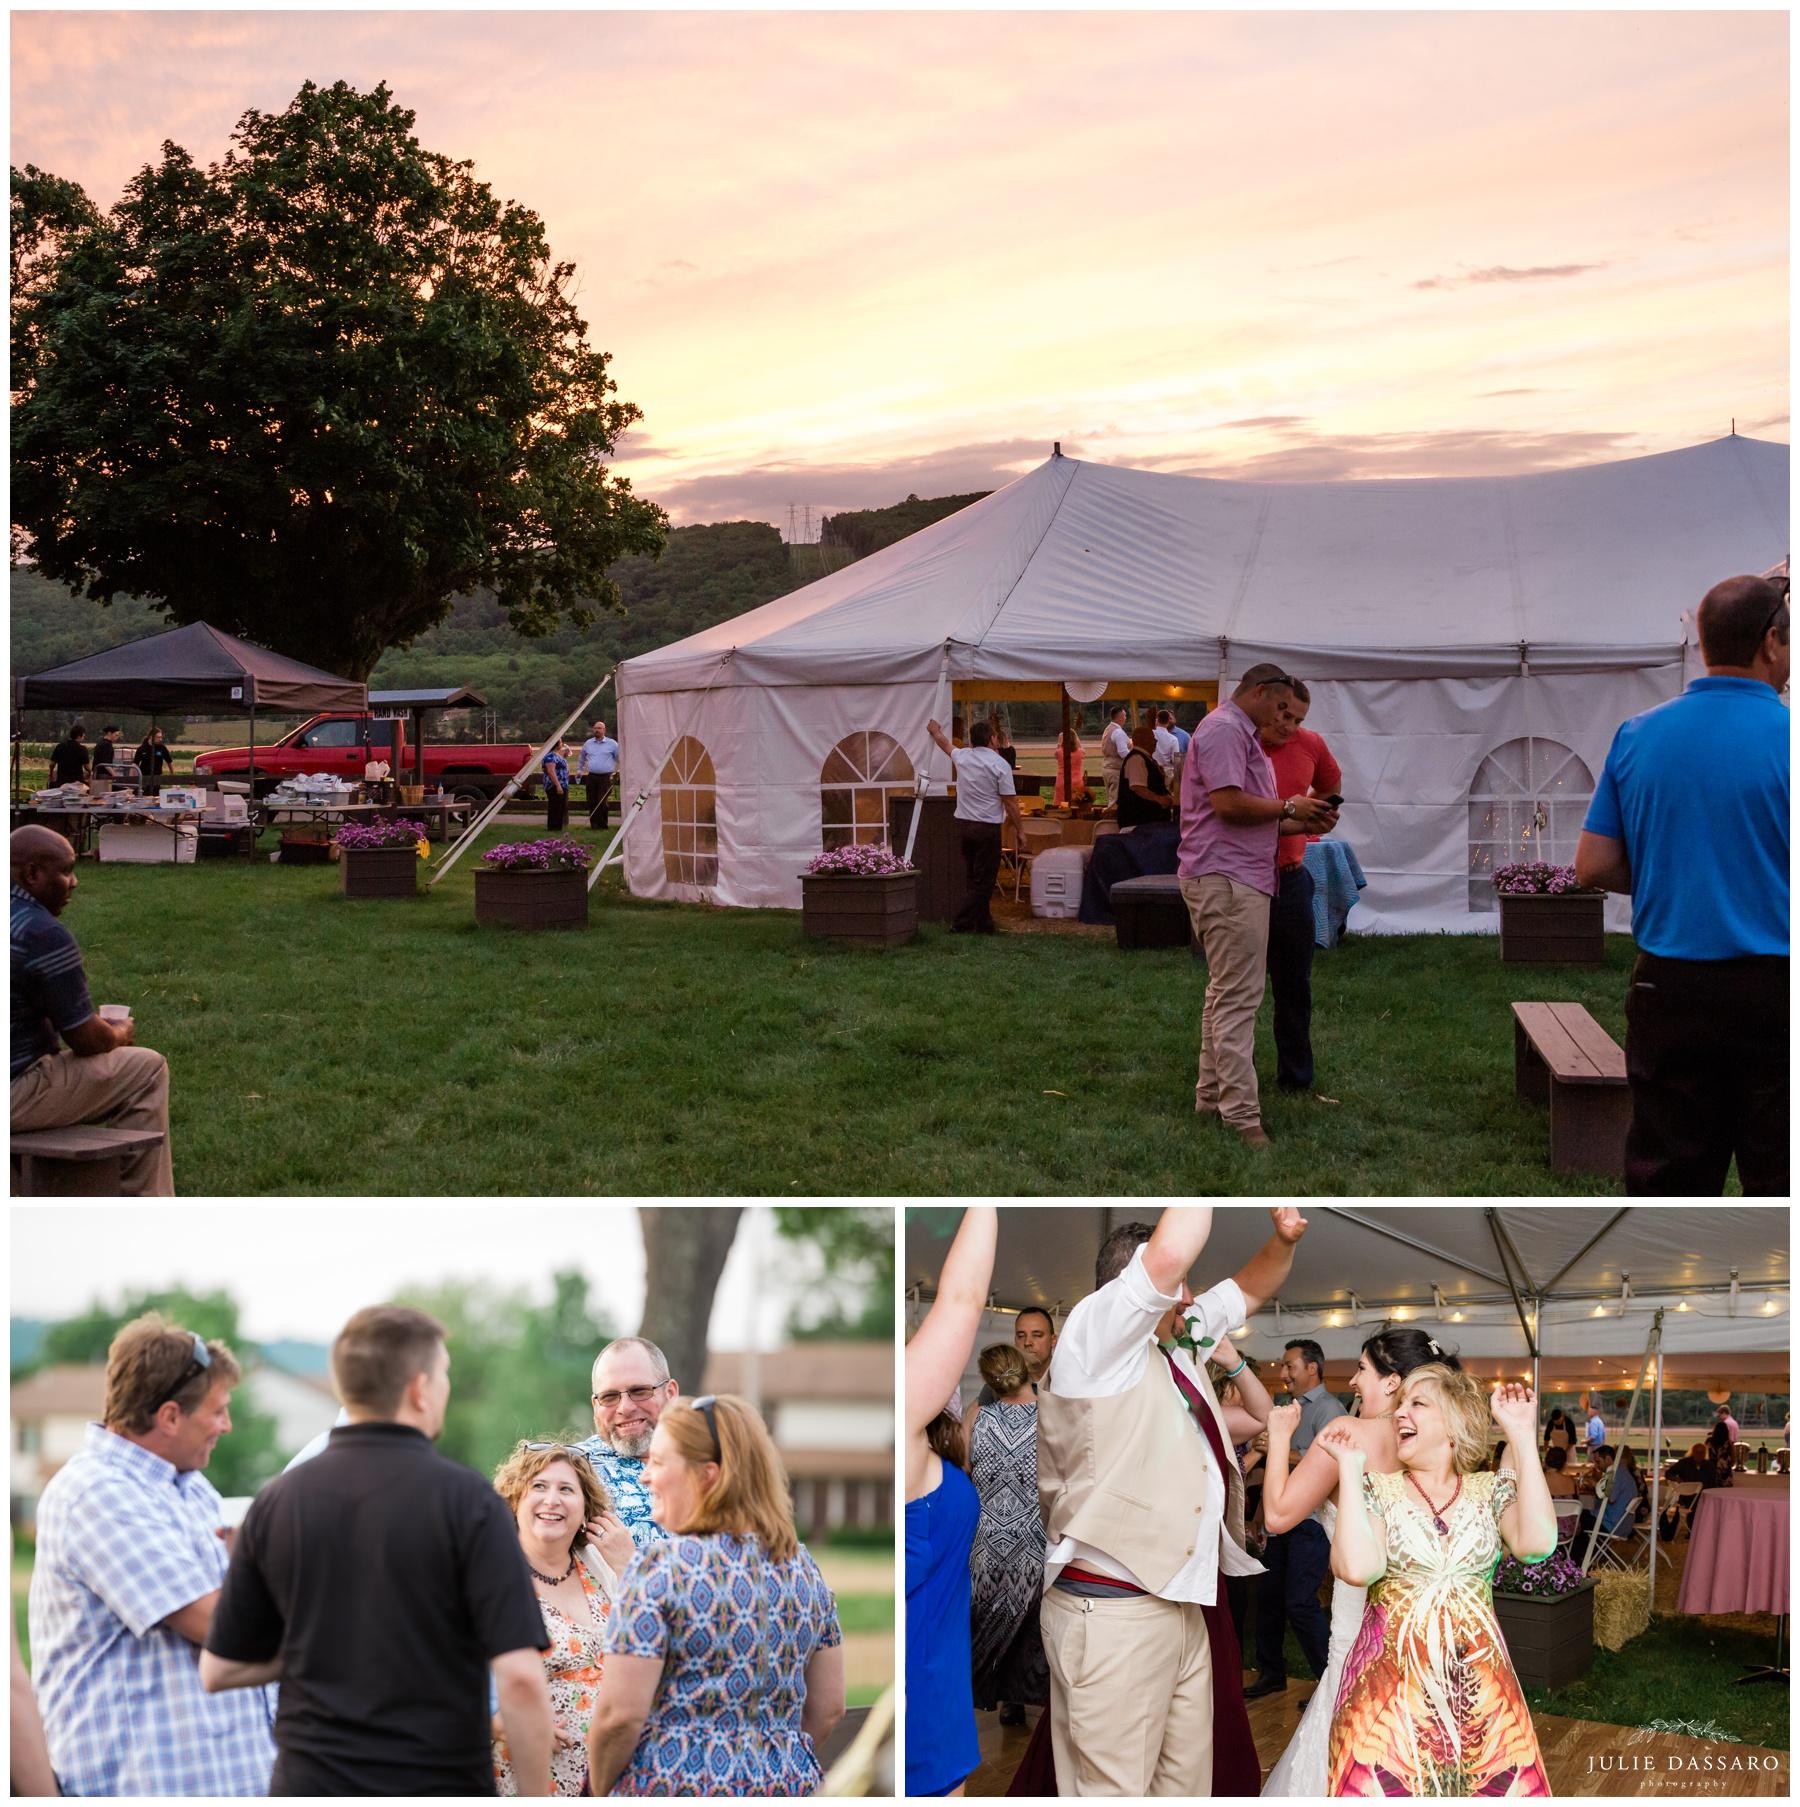 Outdoor wedding tent reception